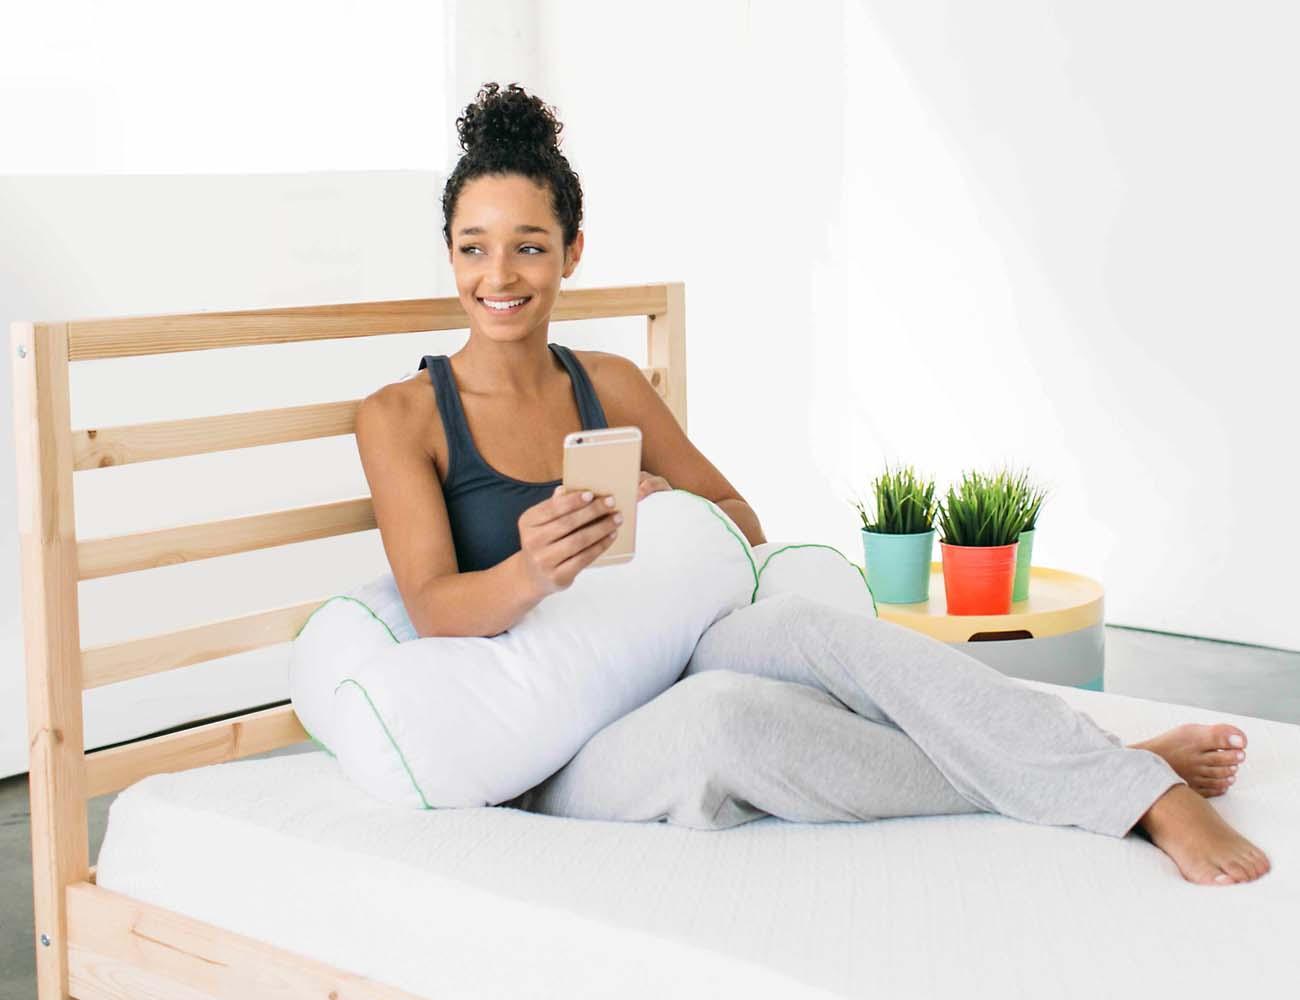 Sleep Yoga™ Posture Pillows – Improve Posture and Help Sleep